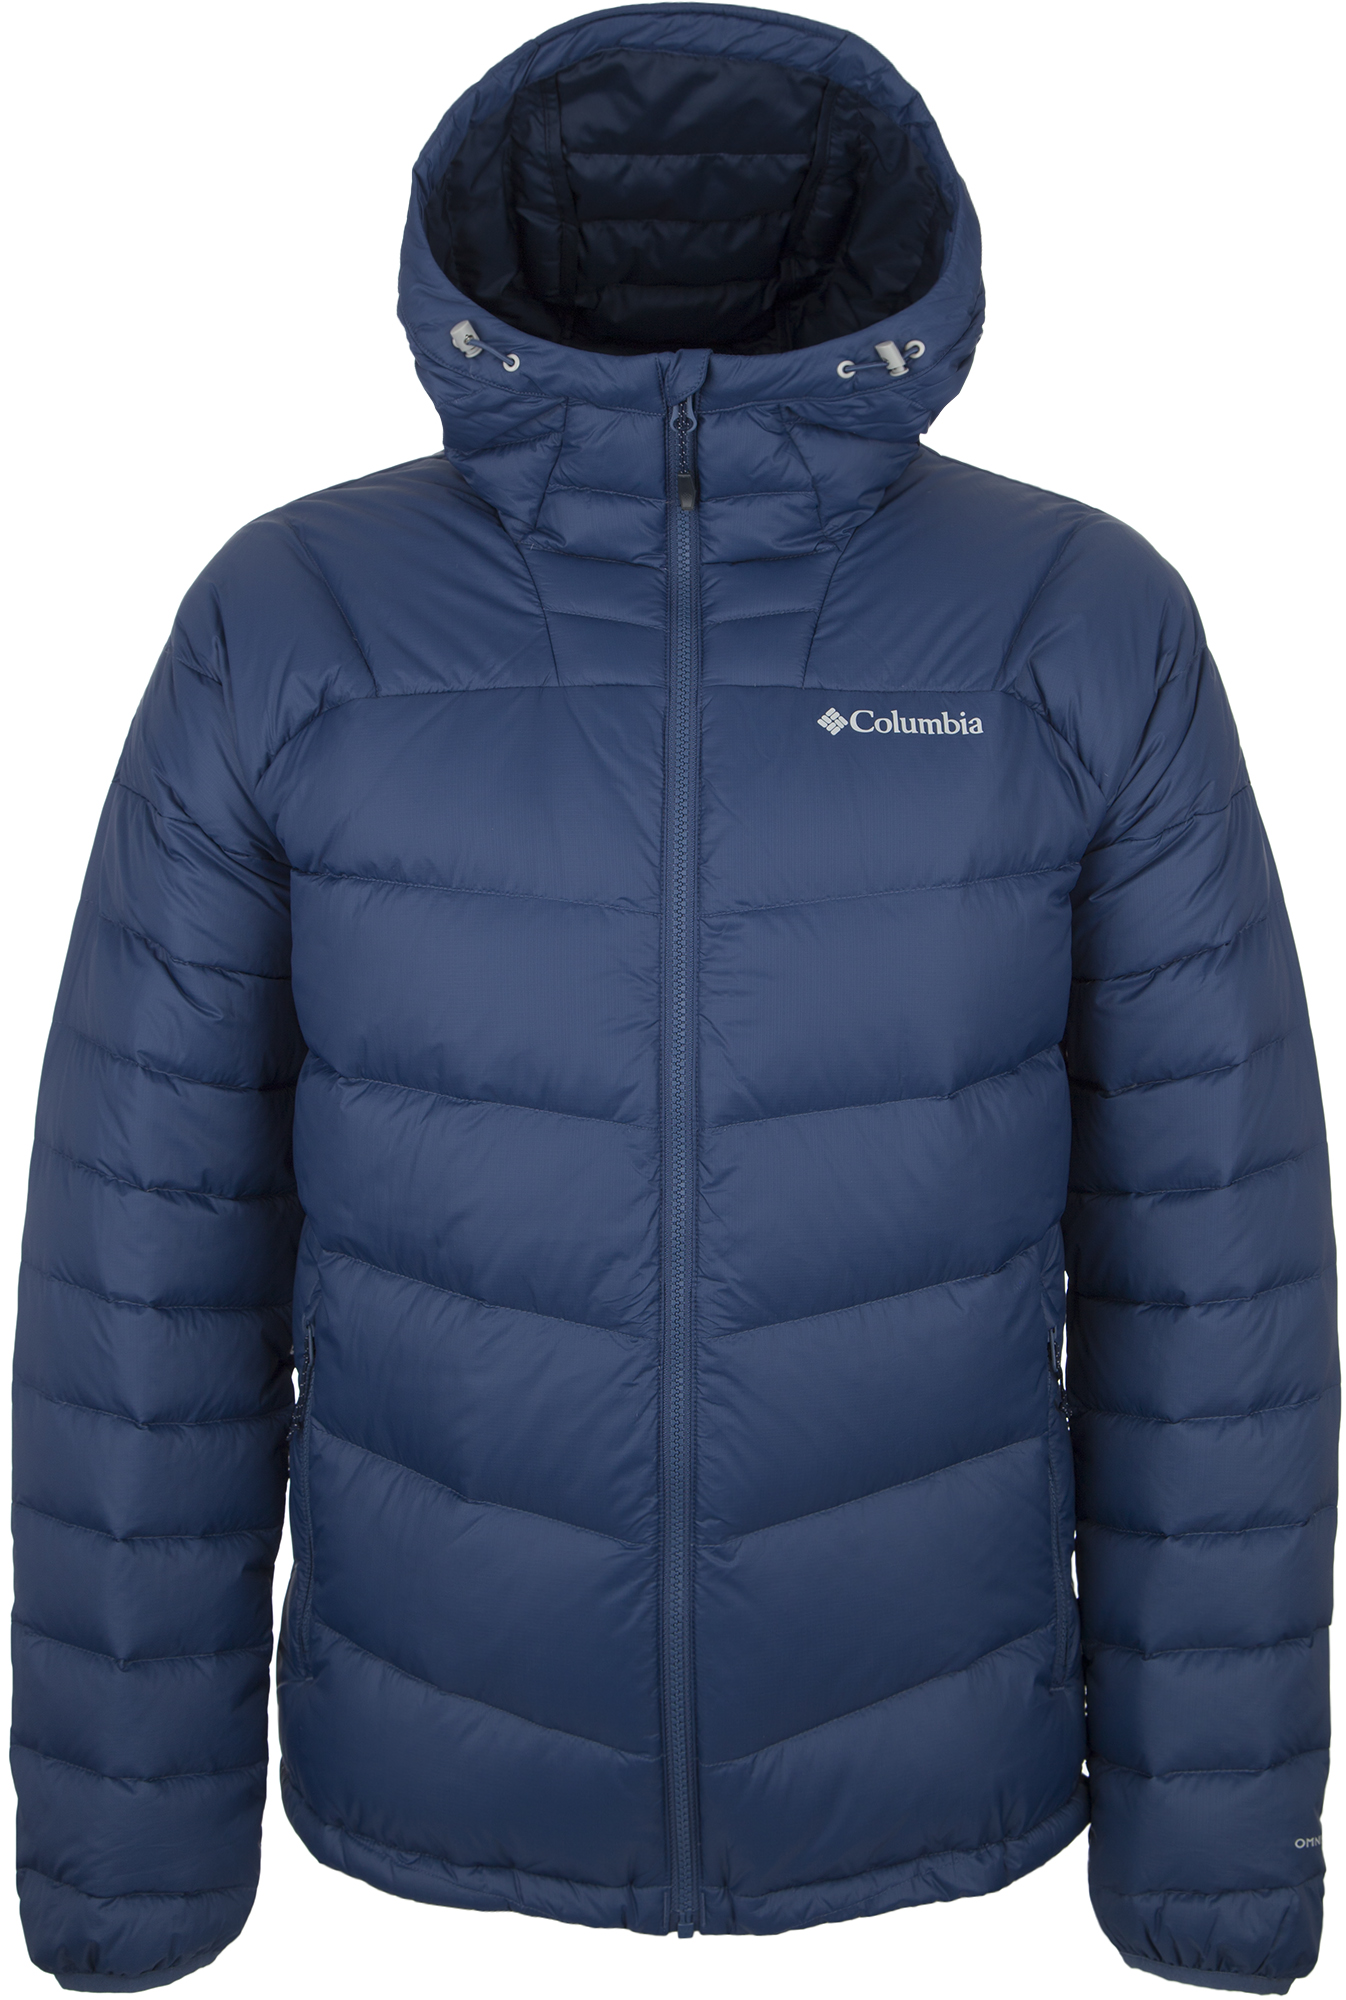 Columbia Куртка пуховая мужская Centennial Creek, размер 56-58